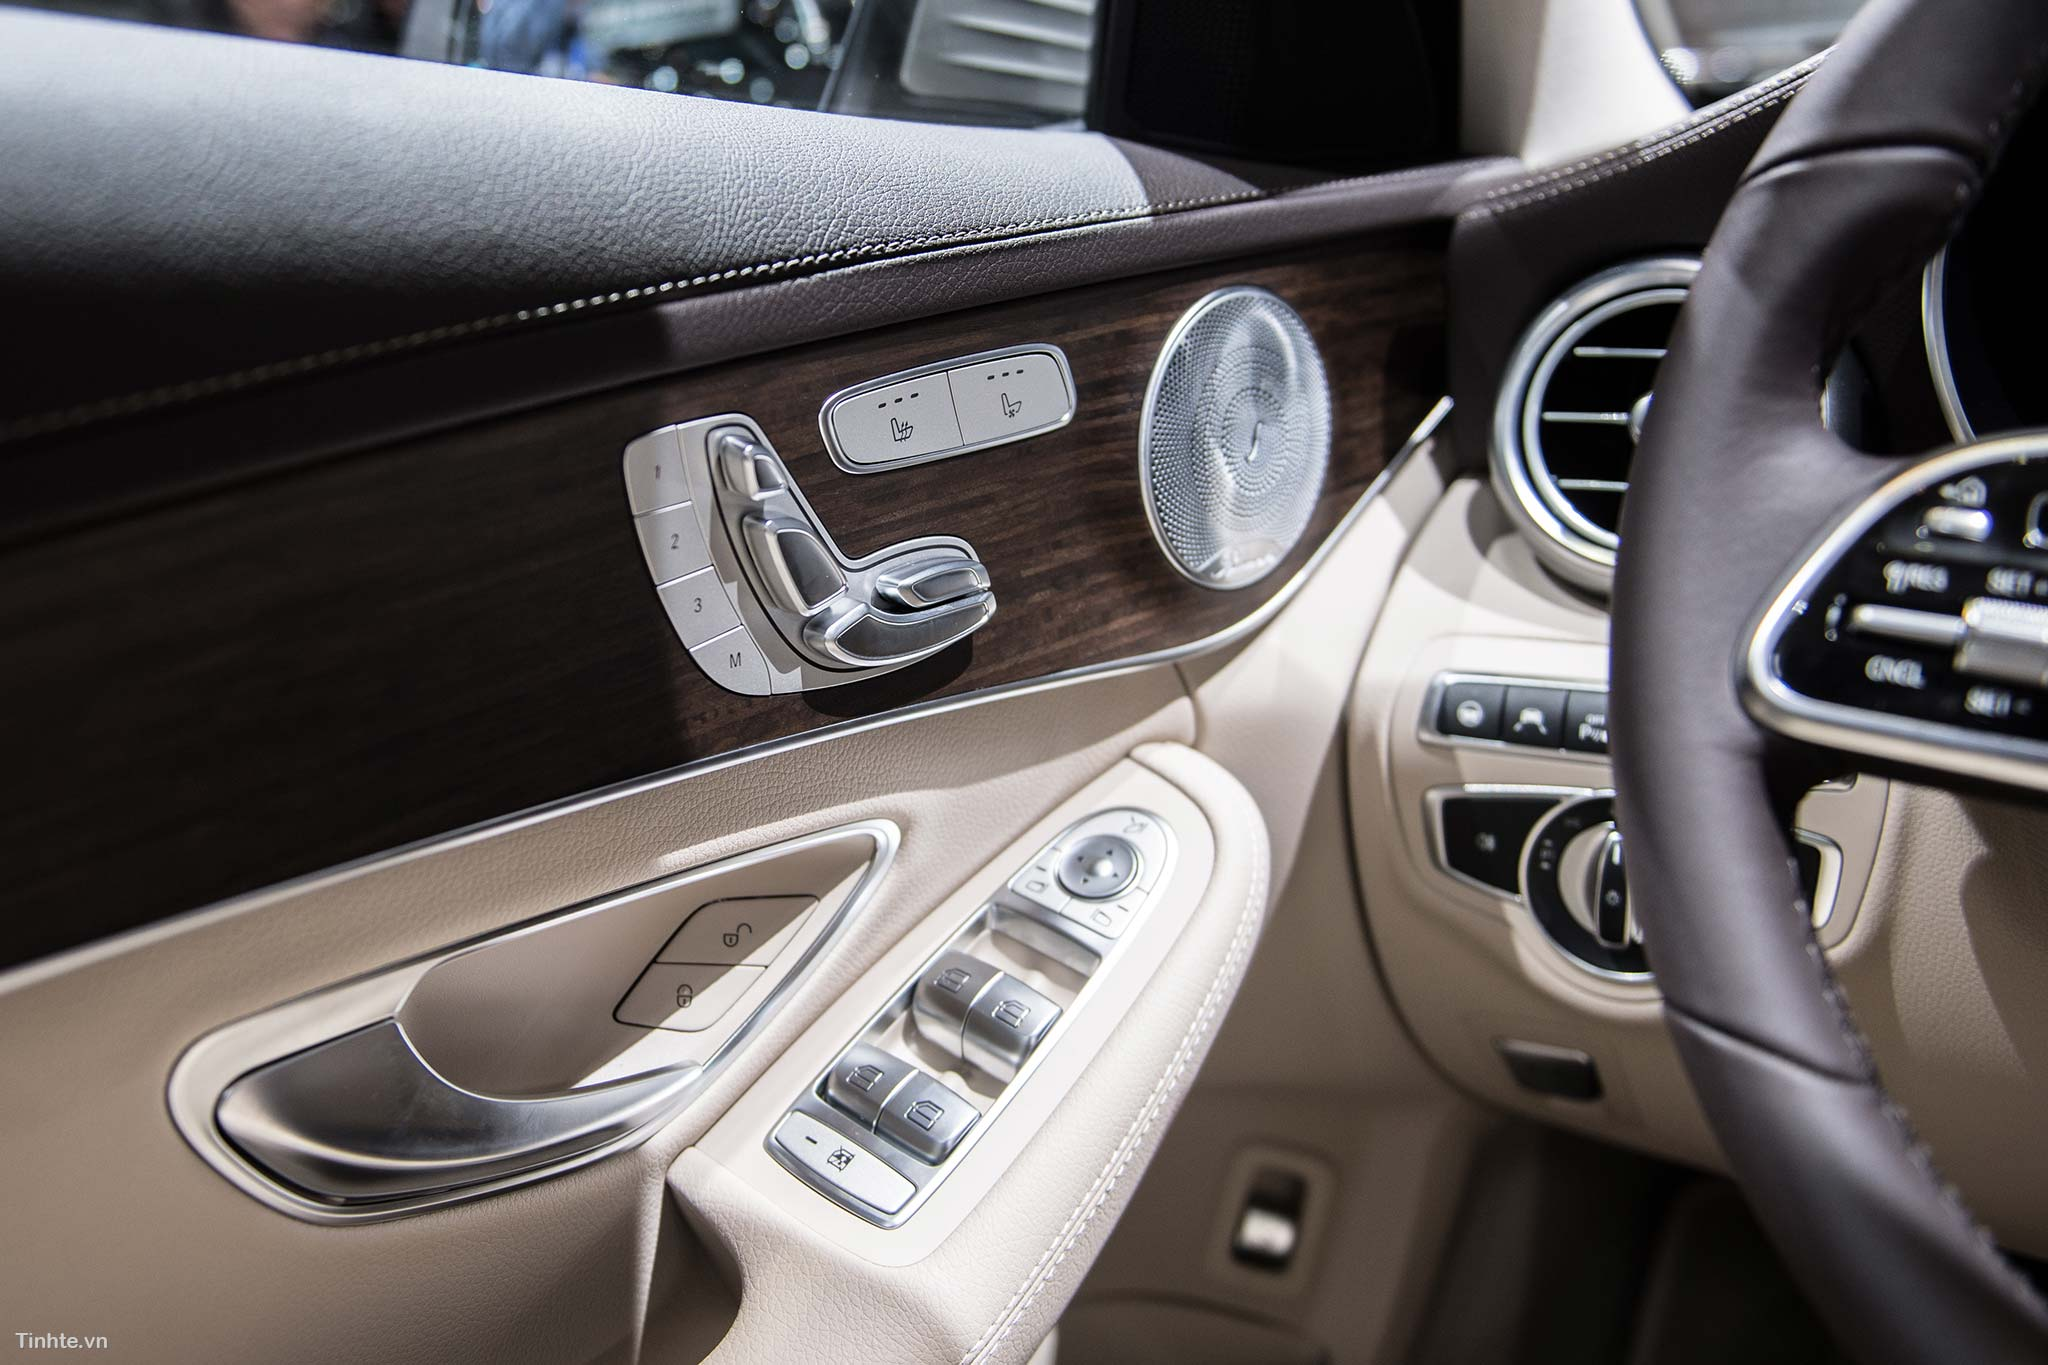 tinhte_Mercedes-Benz-C-200-4MATIC-34.jpg